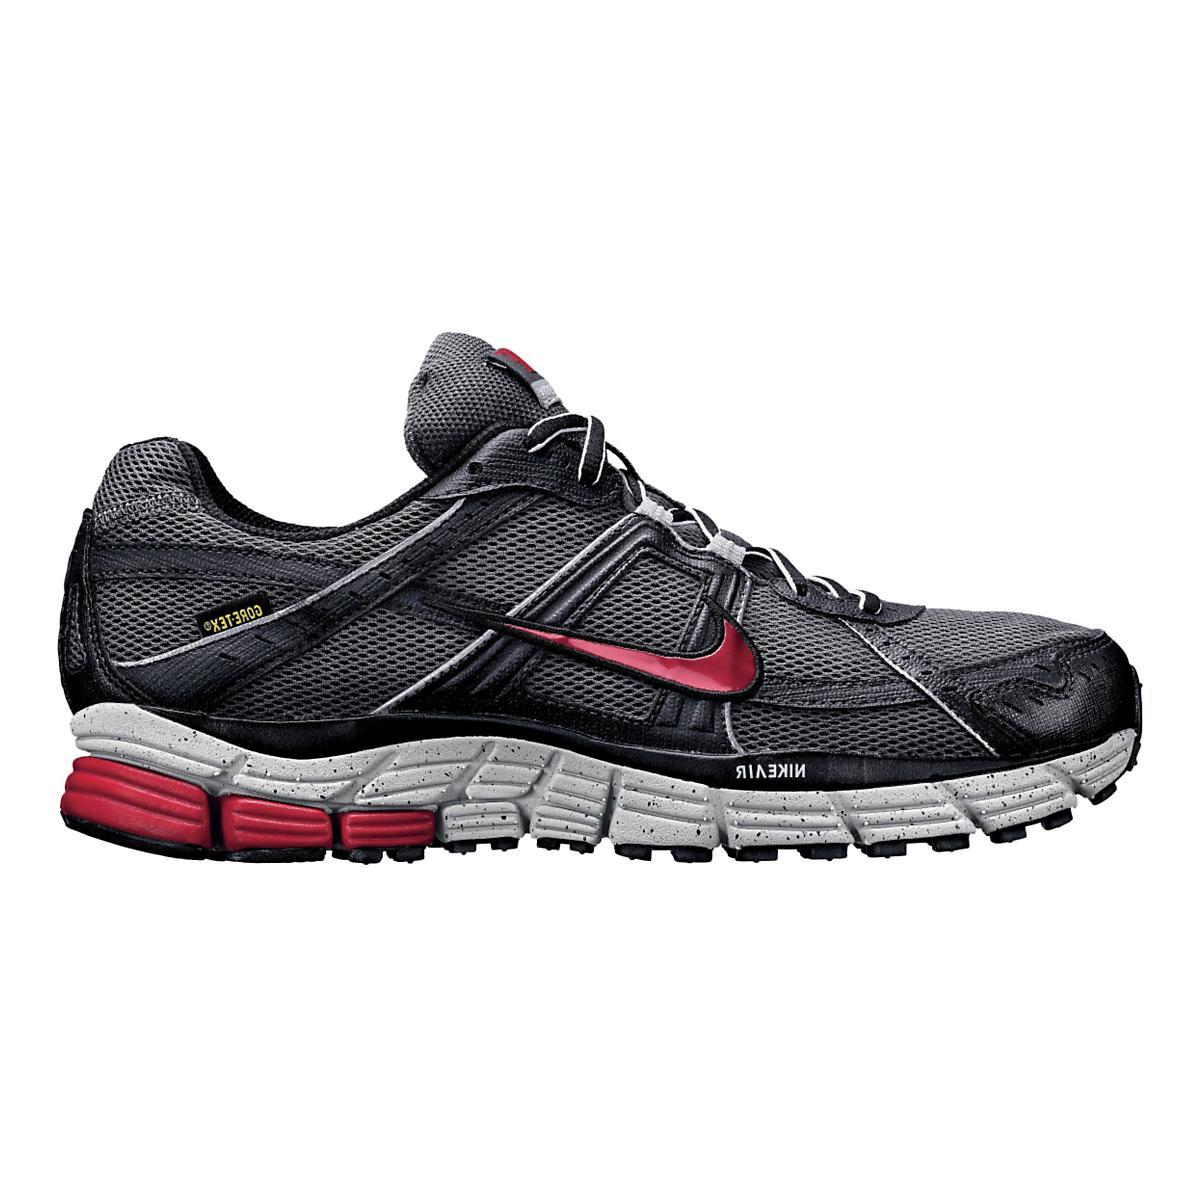 29fa96da14cc Mens Nike Air Pegasus+ 26 GTX Running Shoe at Road Runner Sports